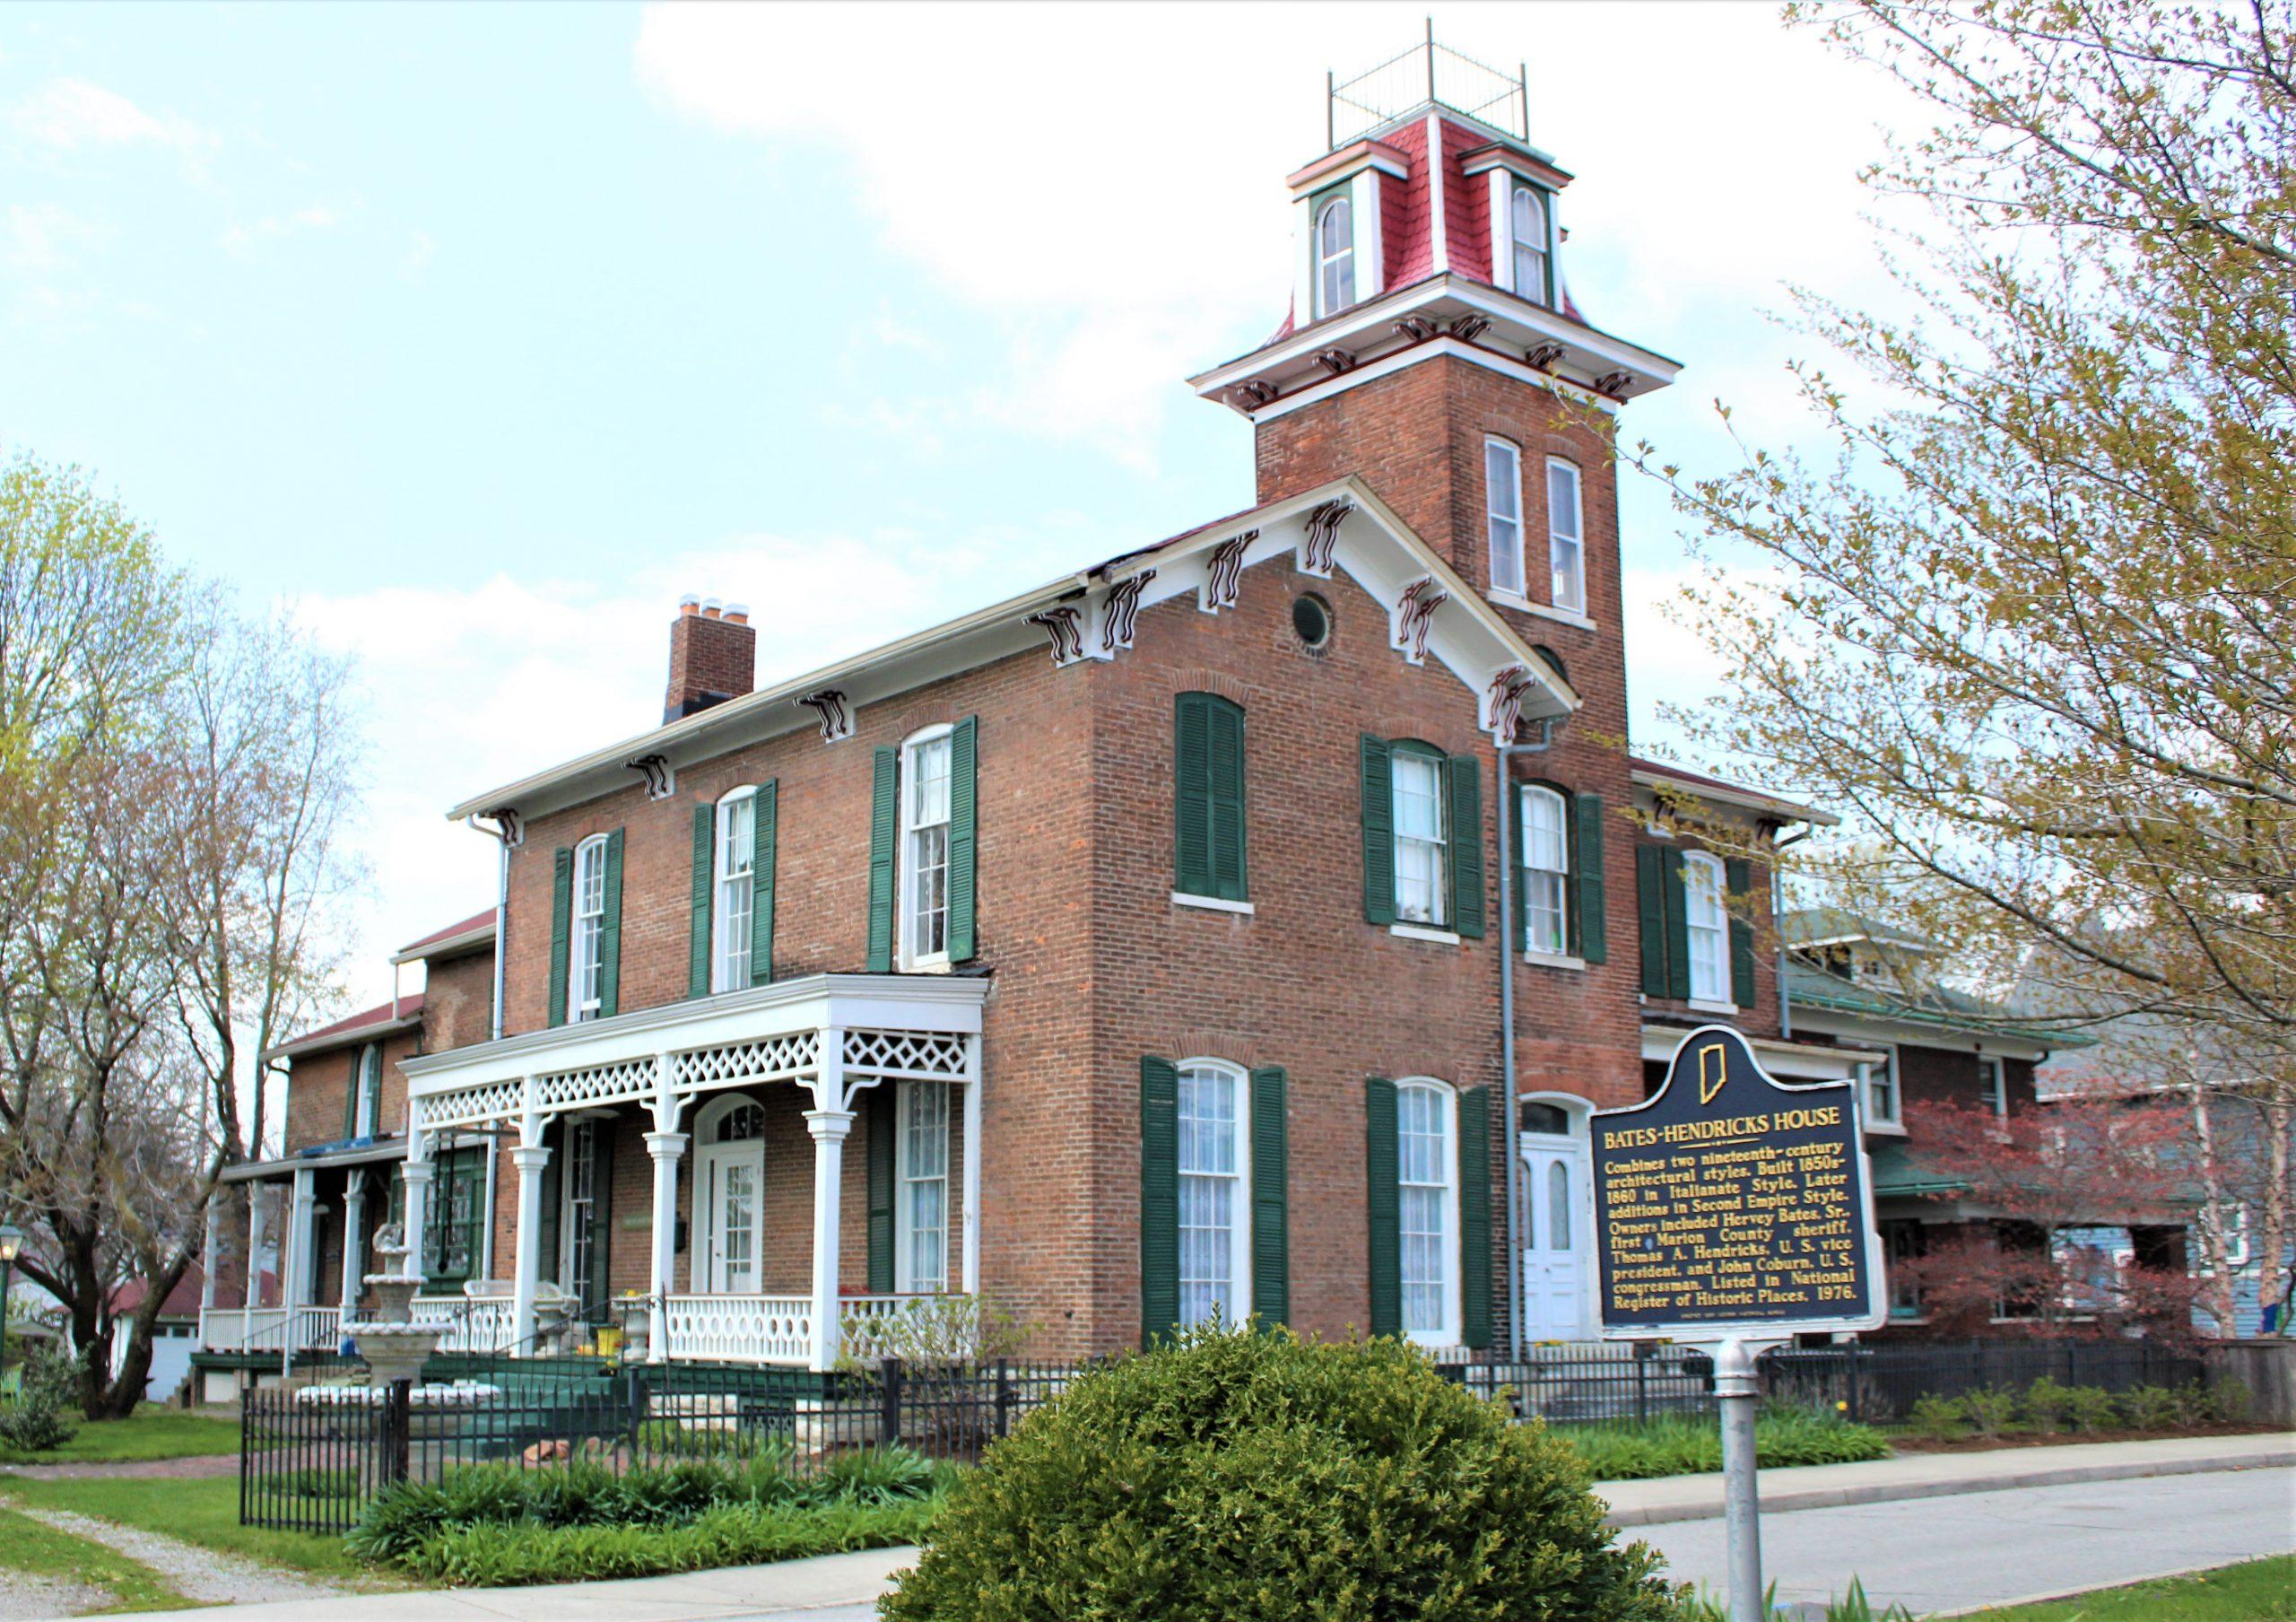 Bates Hendricks House